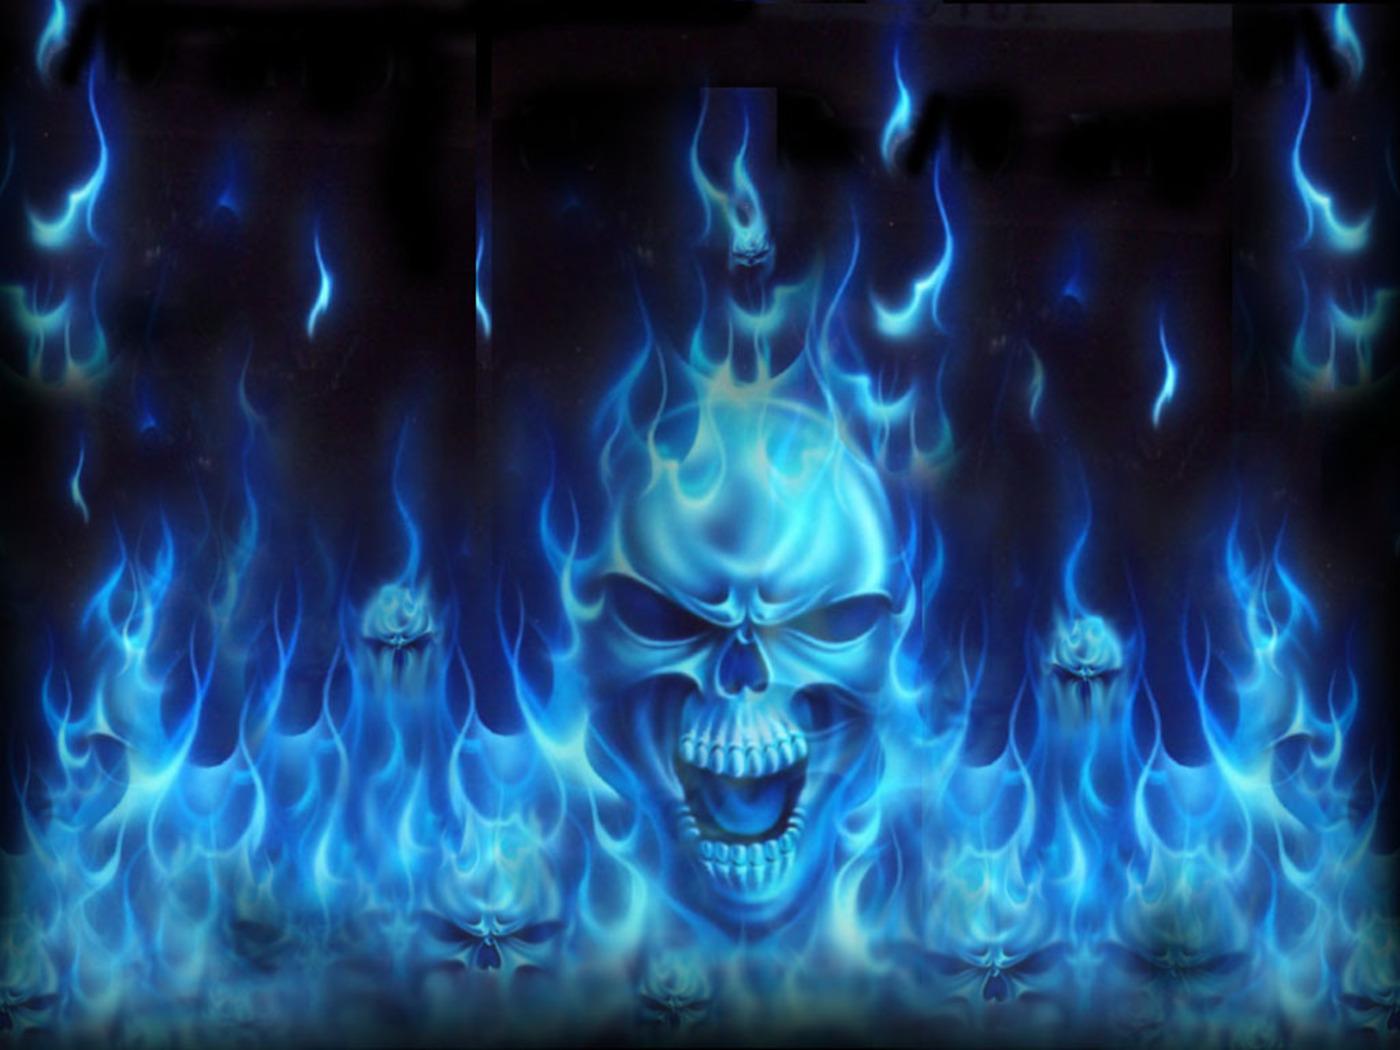 AWESOME SKULLS N STUFF images skull wallpaper cool HD 1400x1050